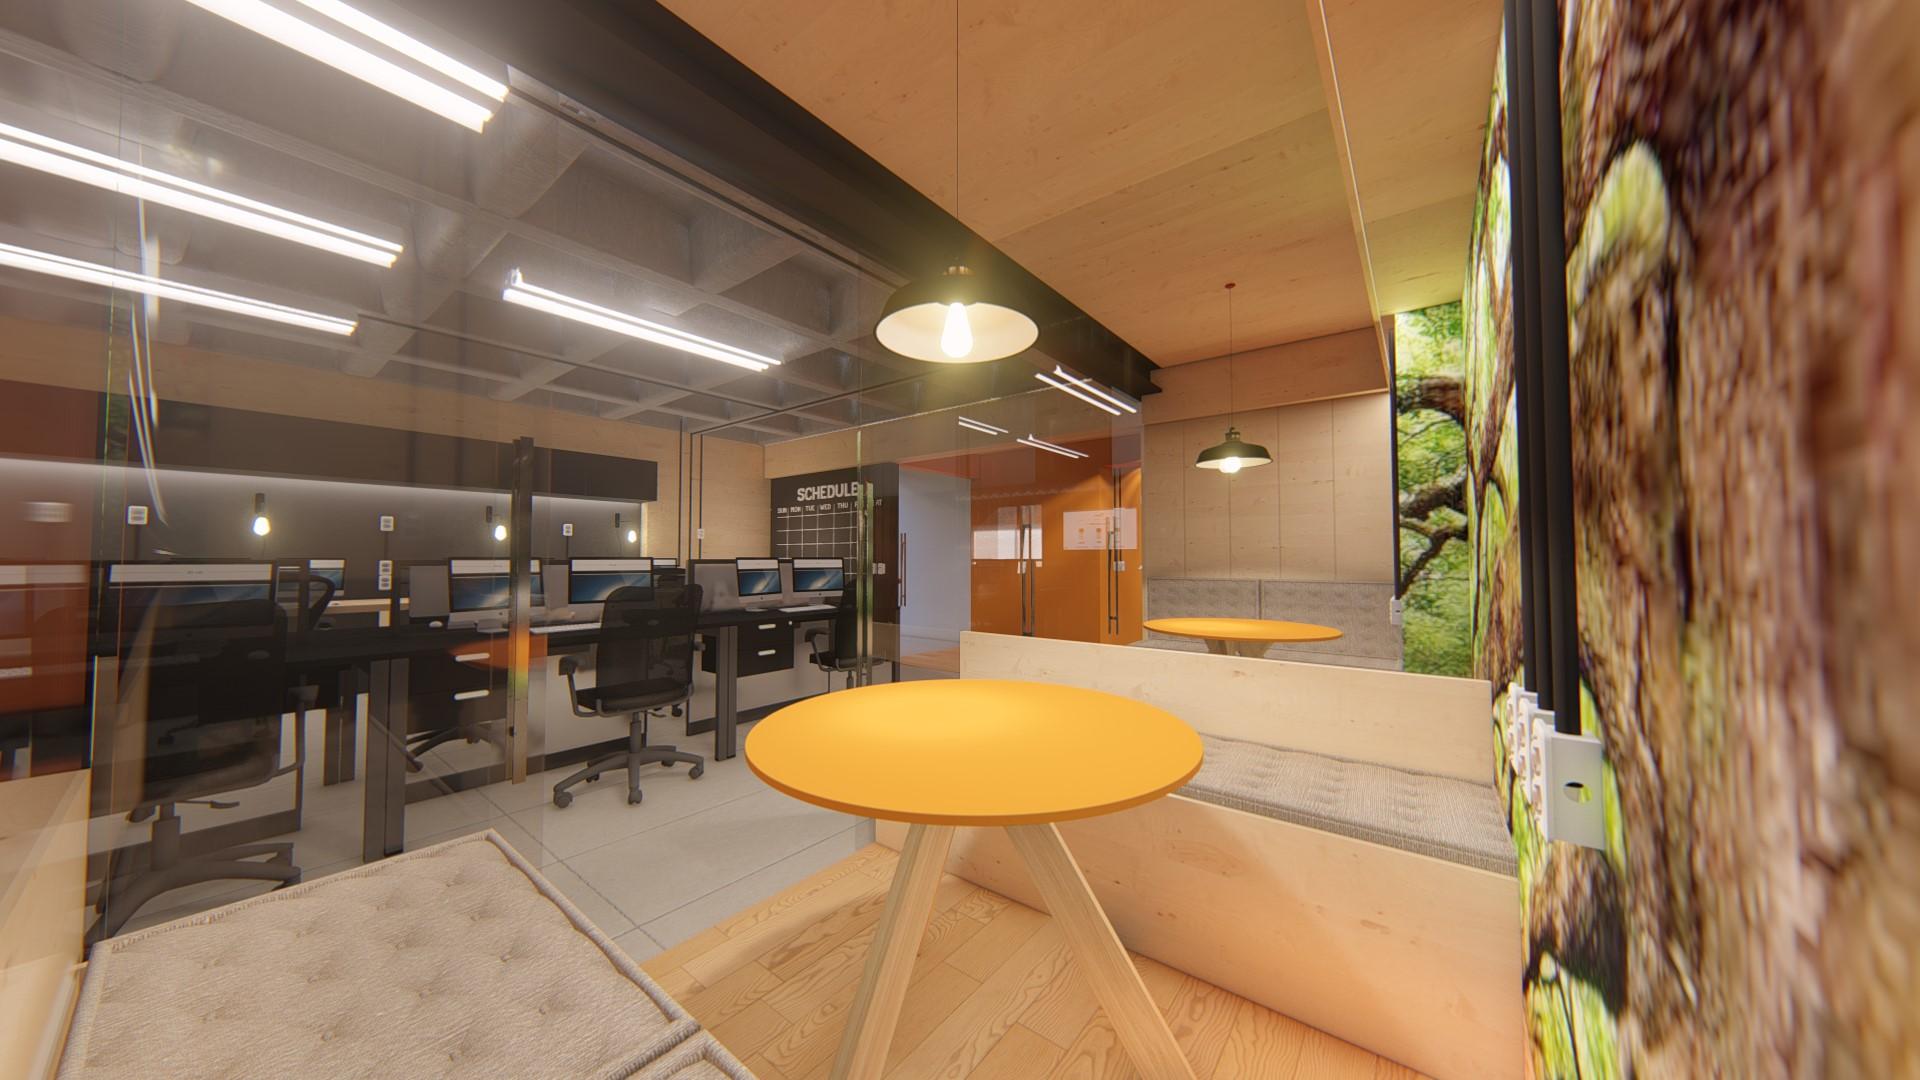 projeto-arquitetonico-cajueiro-duo-arquitetura-019.jpg